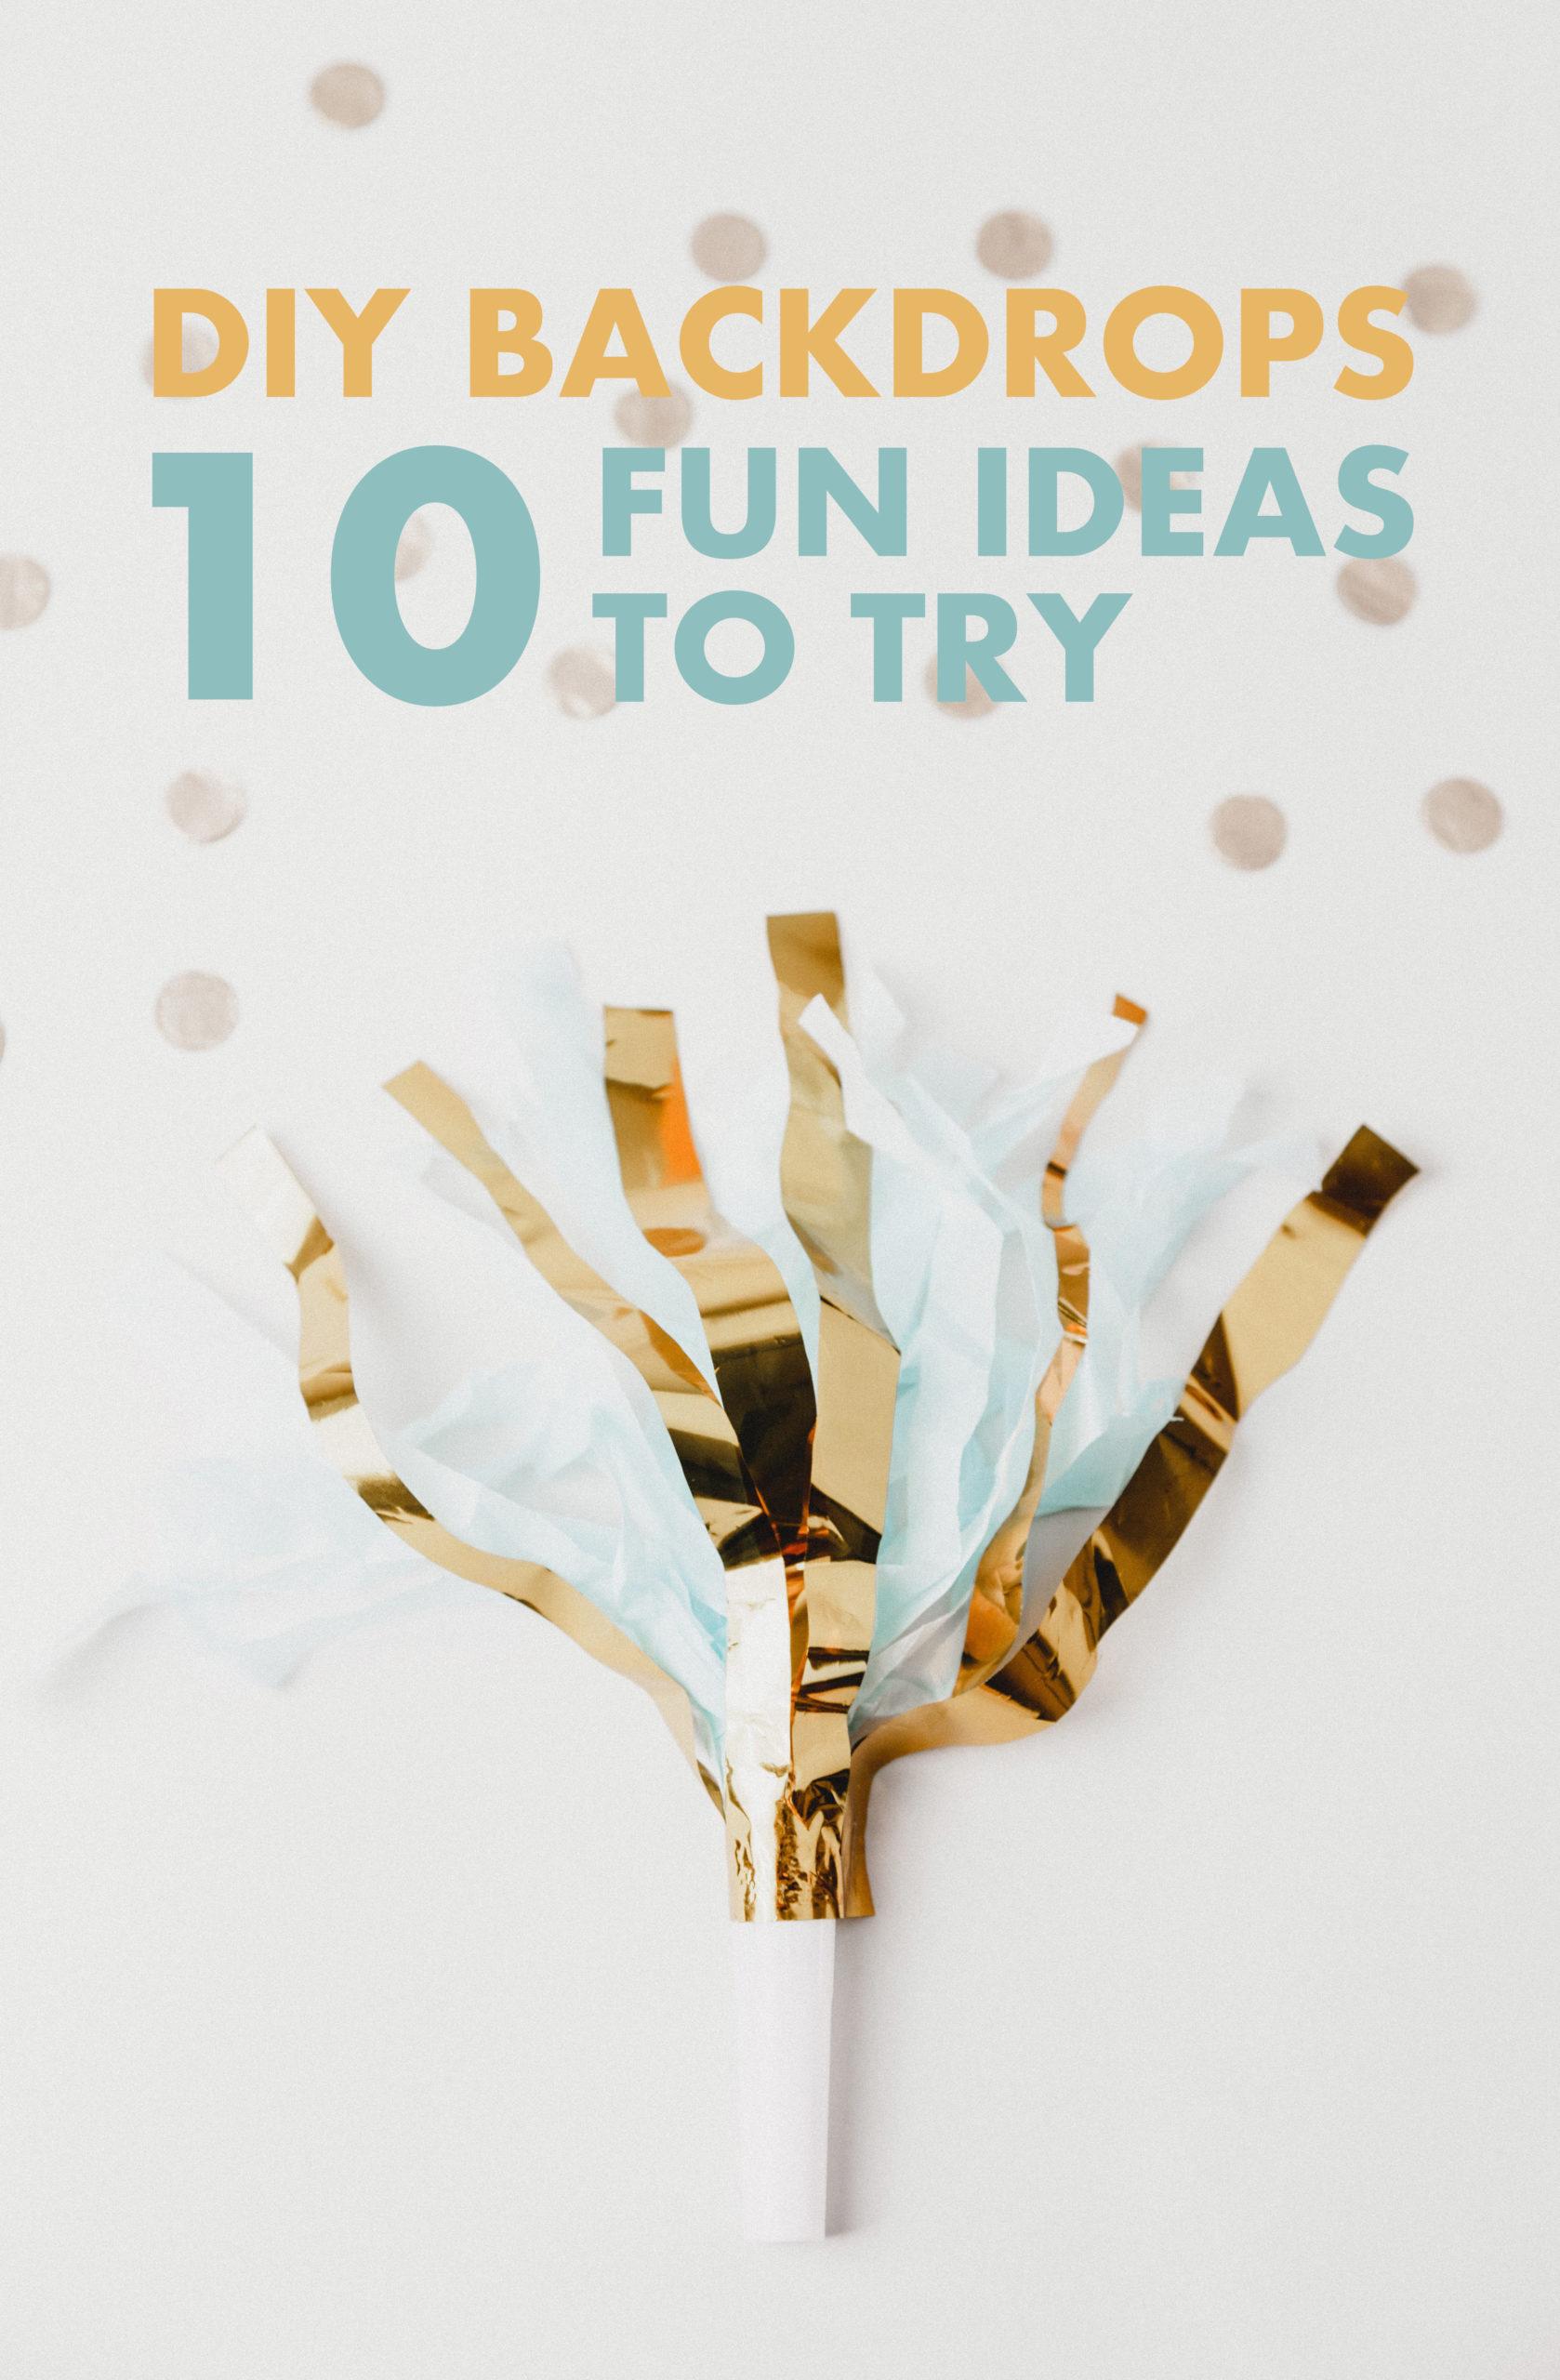 Diy Photography Backdrops 10 Fun Ideas To Try Filtergrade